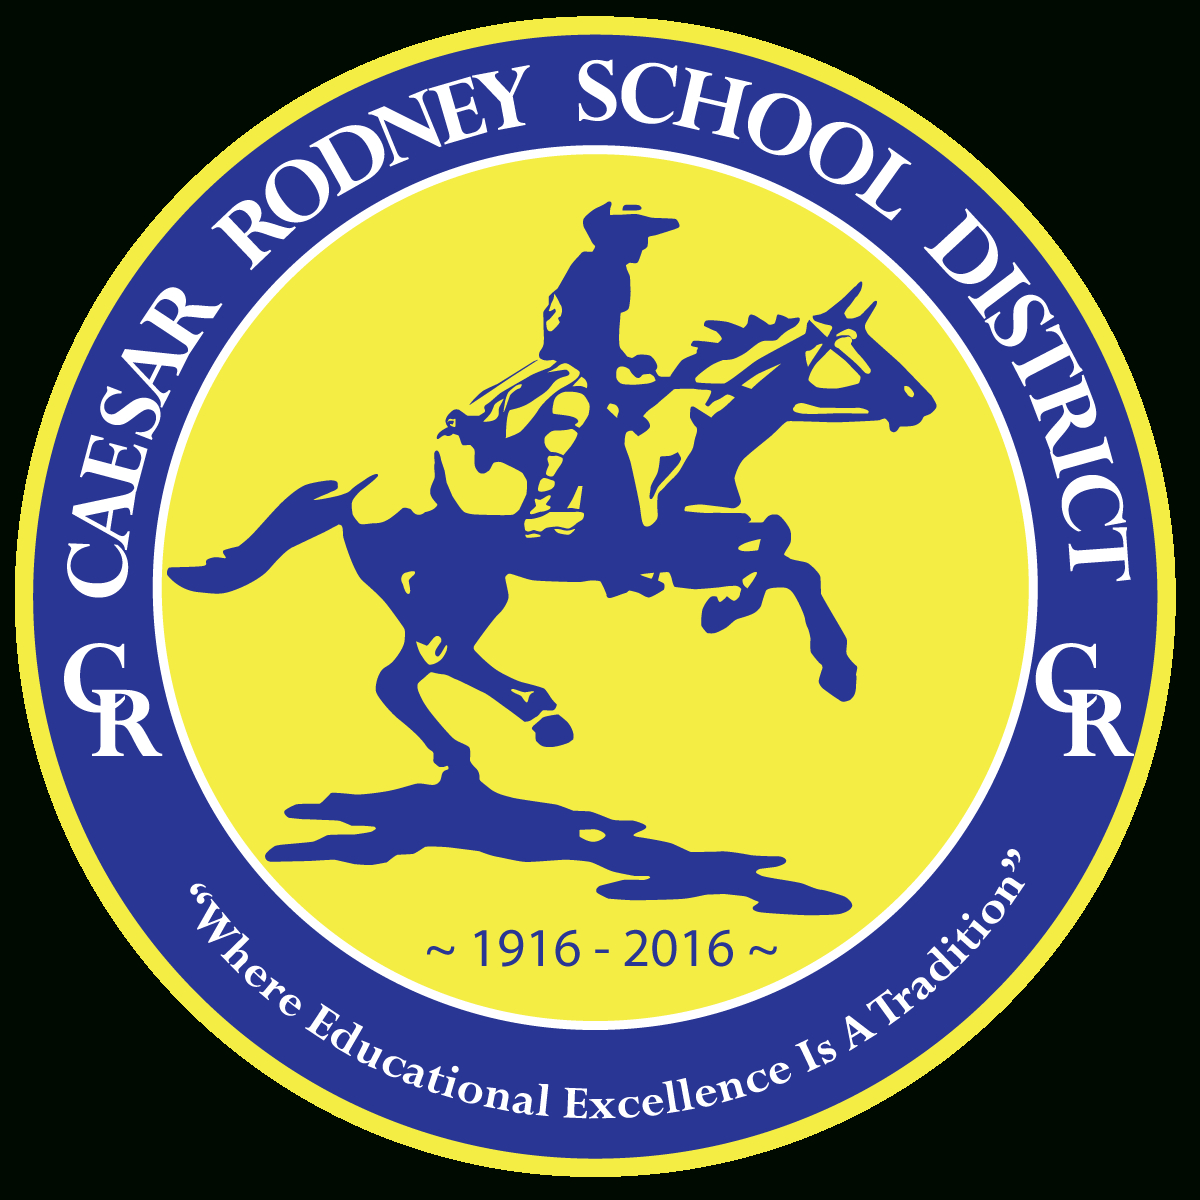 Caesar Rodney School District | Teaching | Pinterest pertaining to Appoquinimink School District Calendar